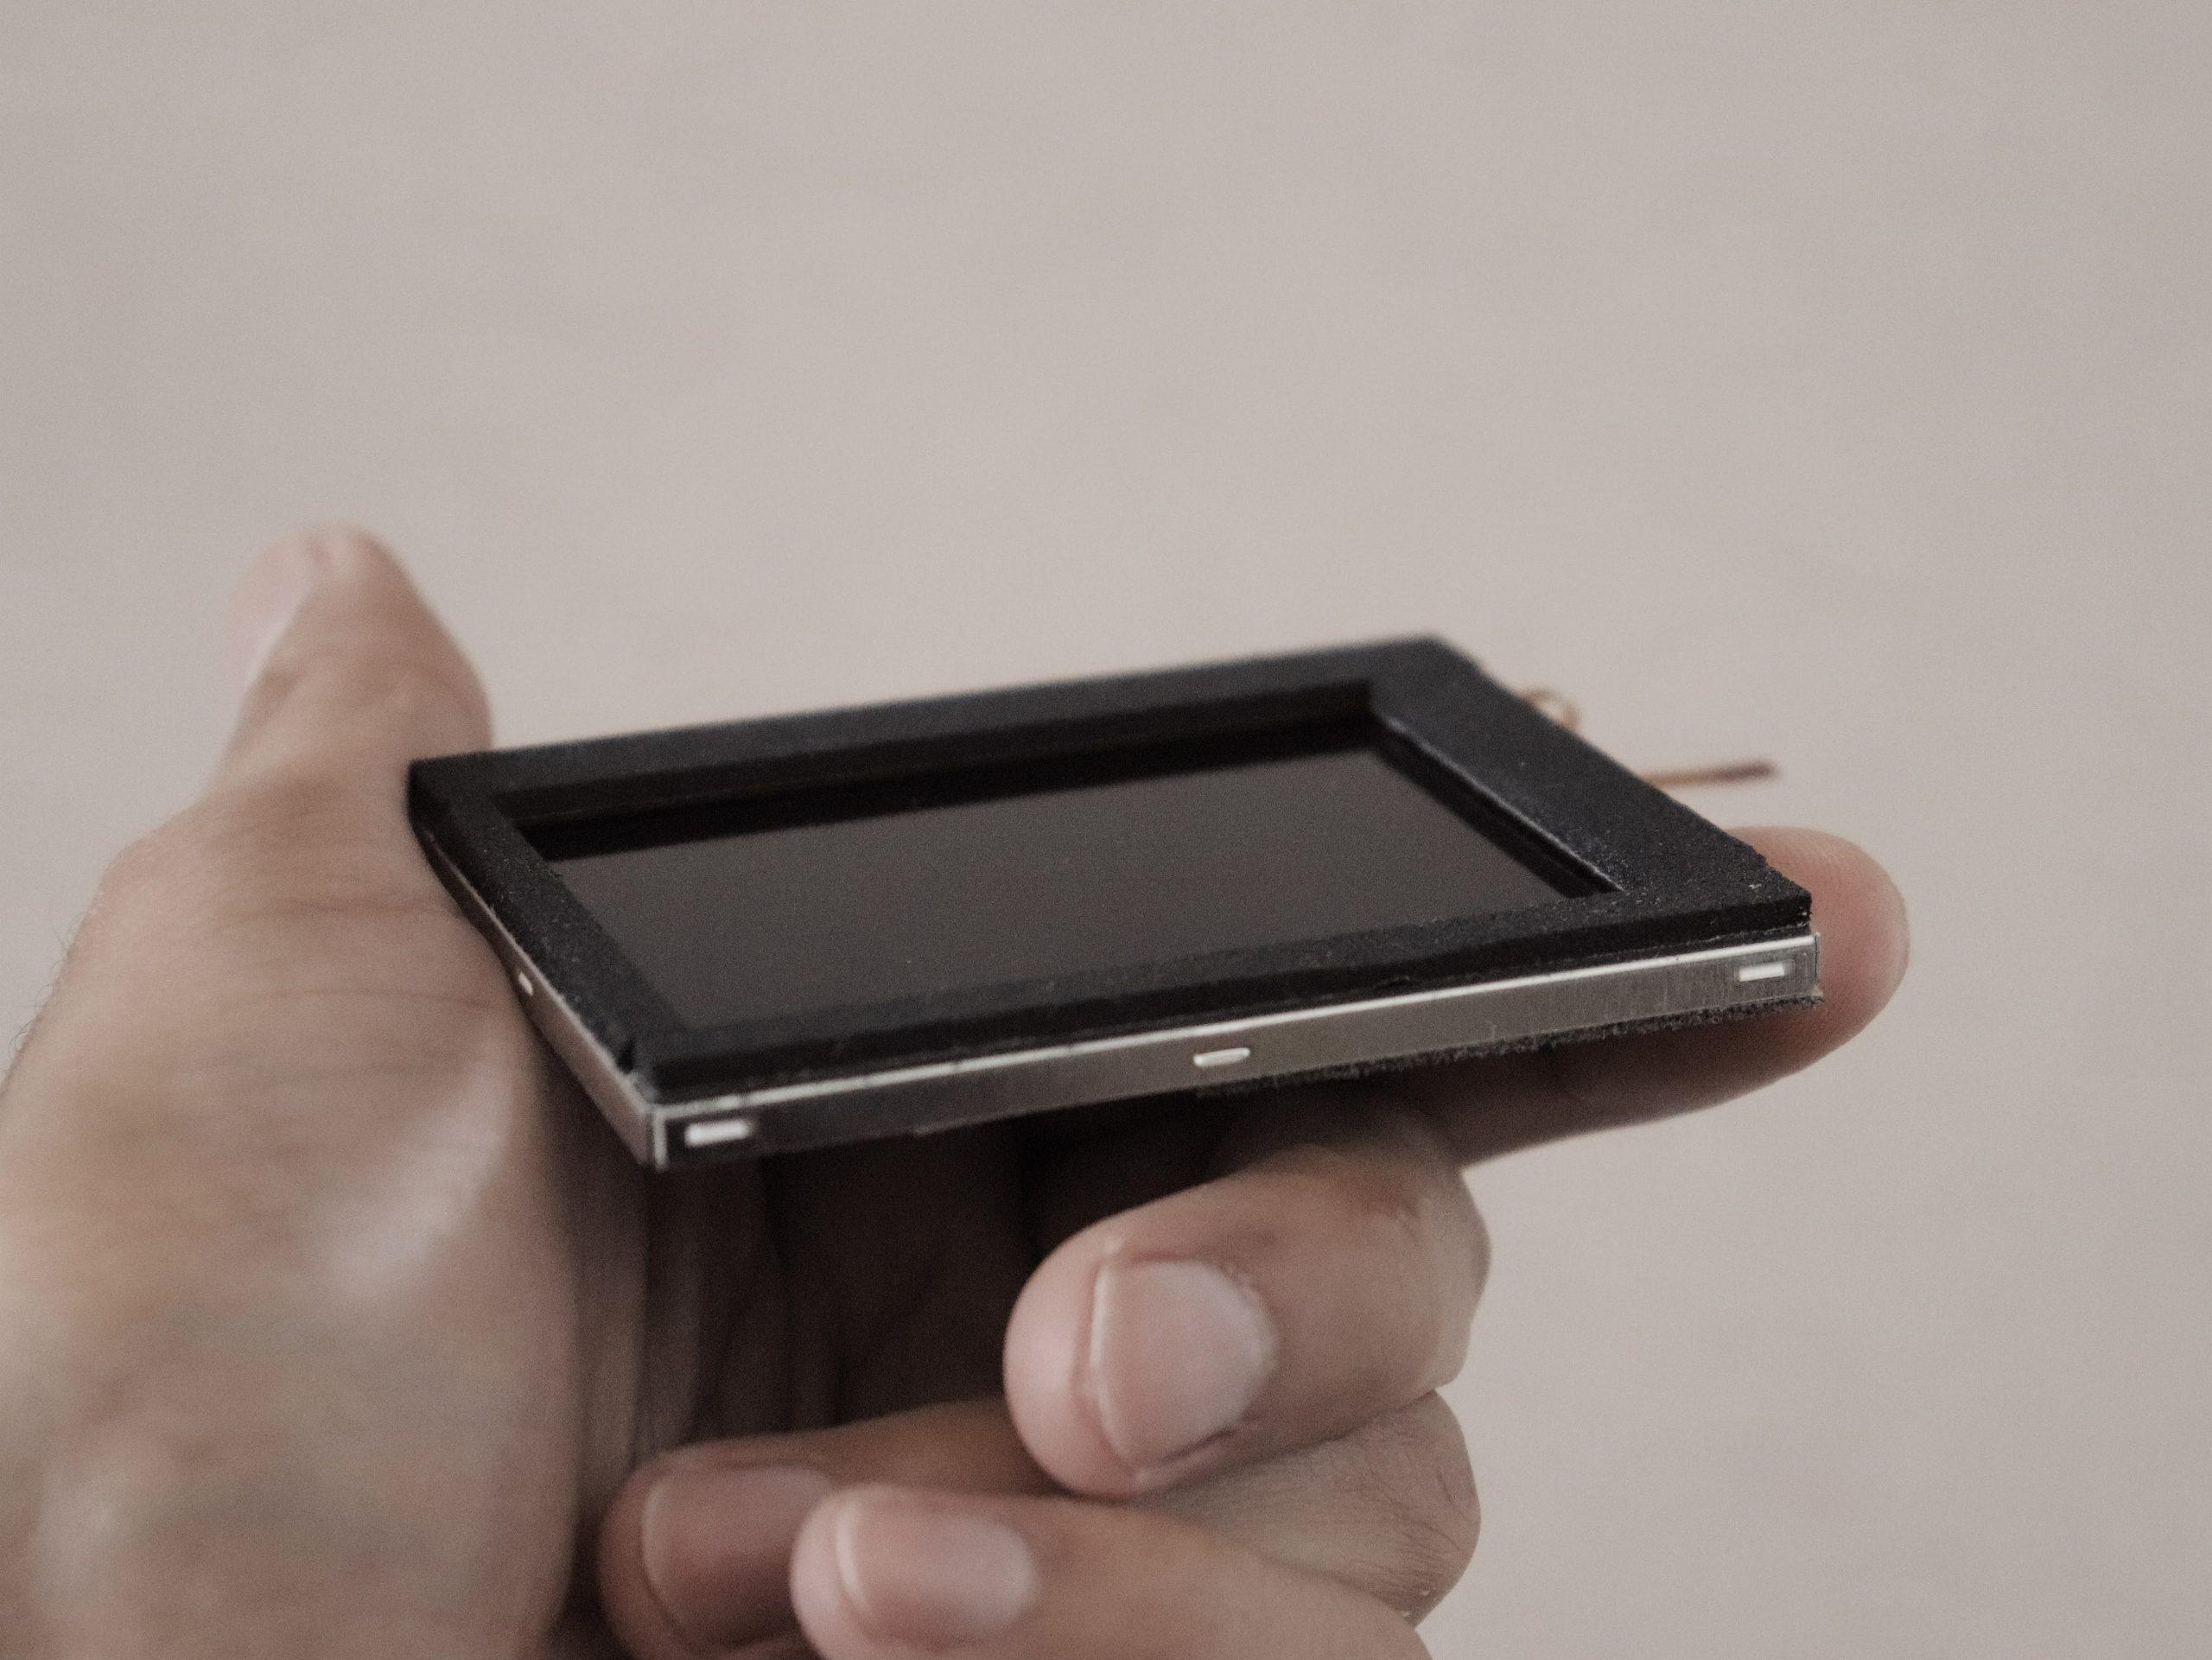 Gameboy Macro Fatty Lens Guide